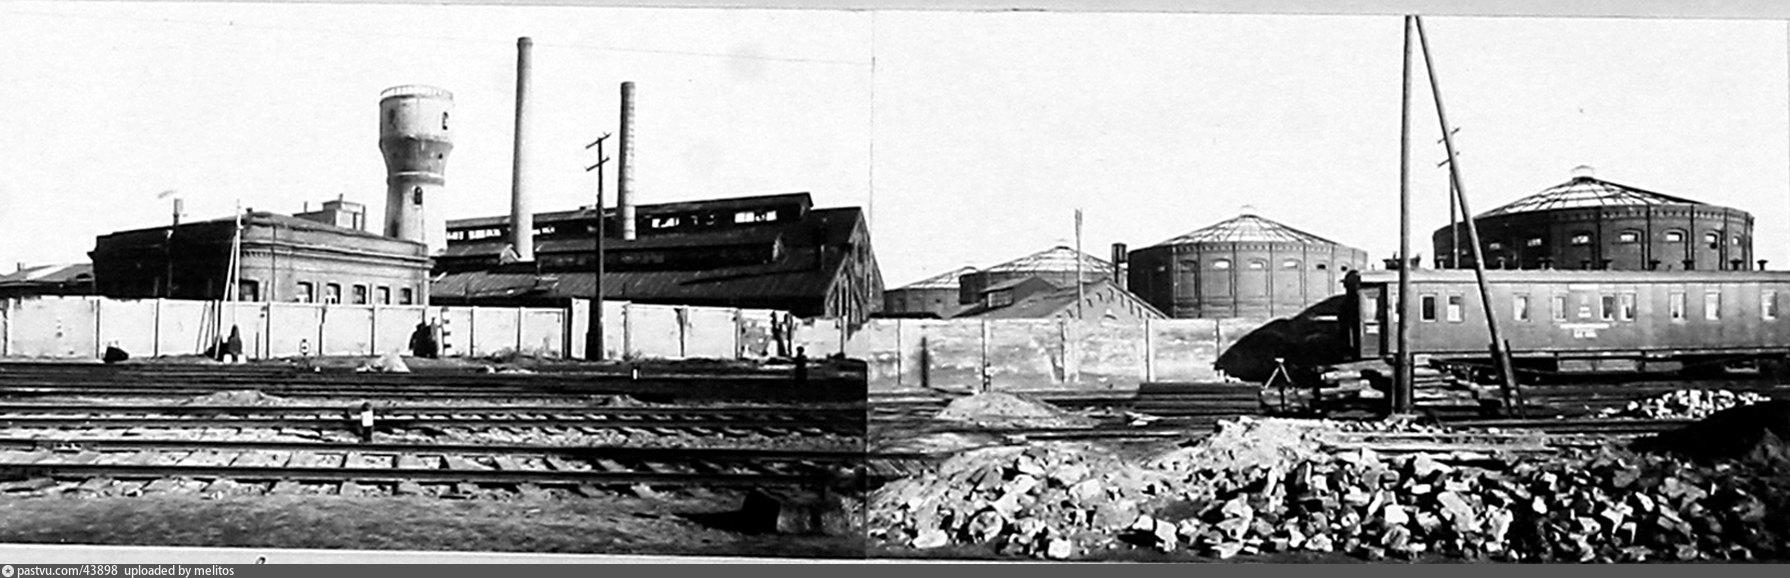 Завод «АРМА» в конце сороковых годов XX века